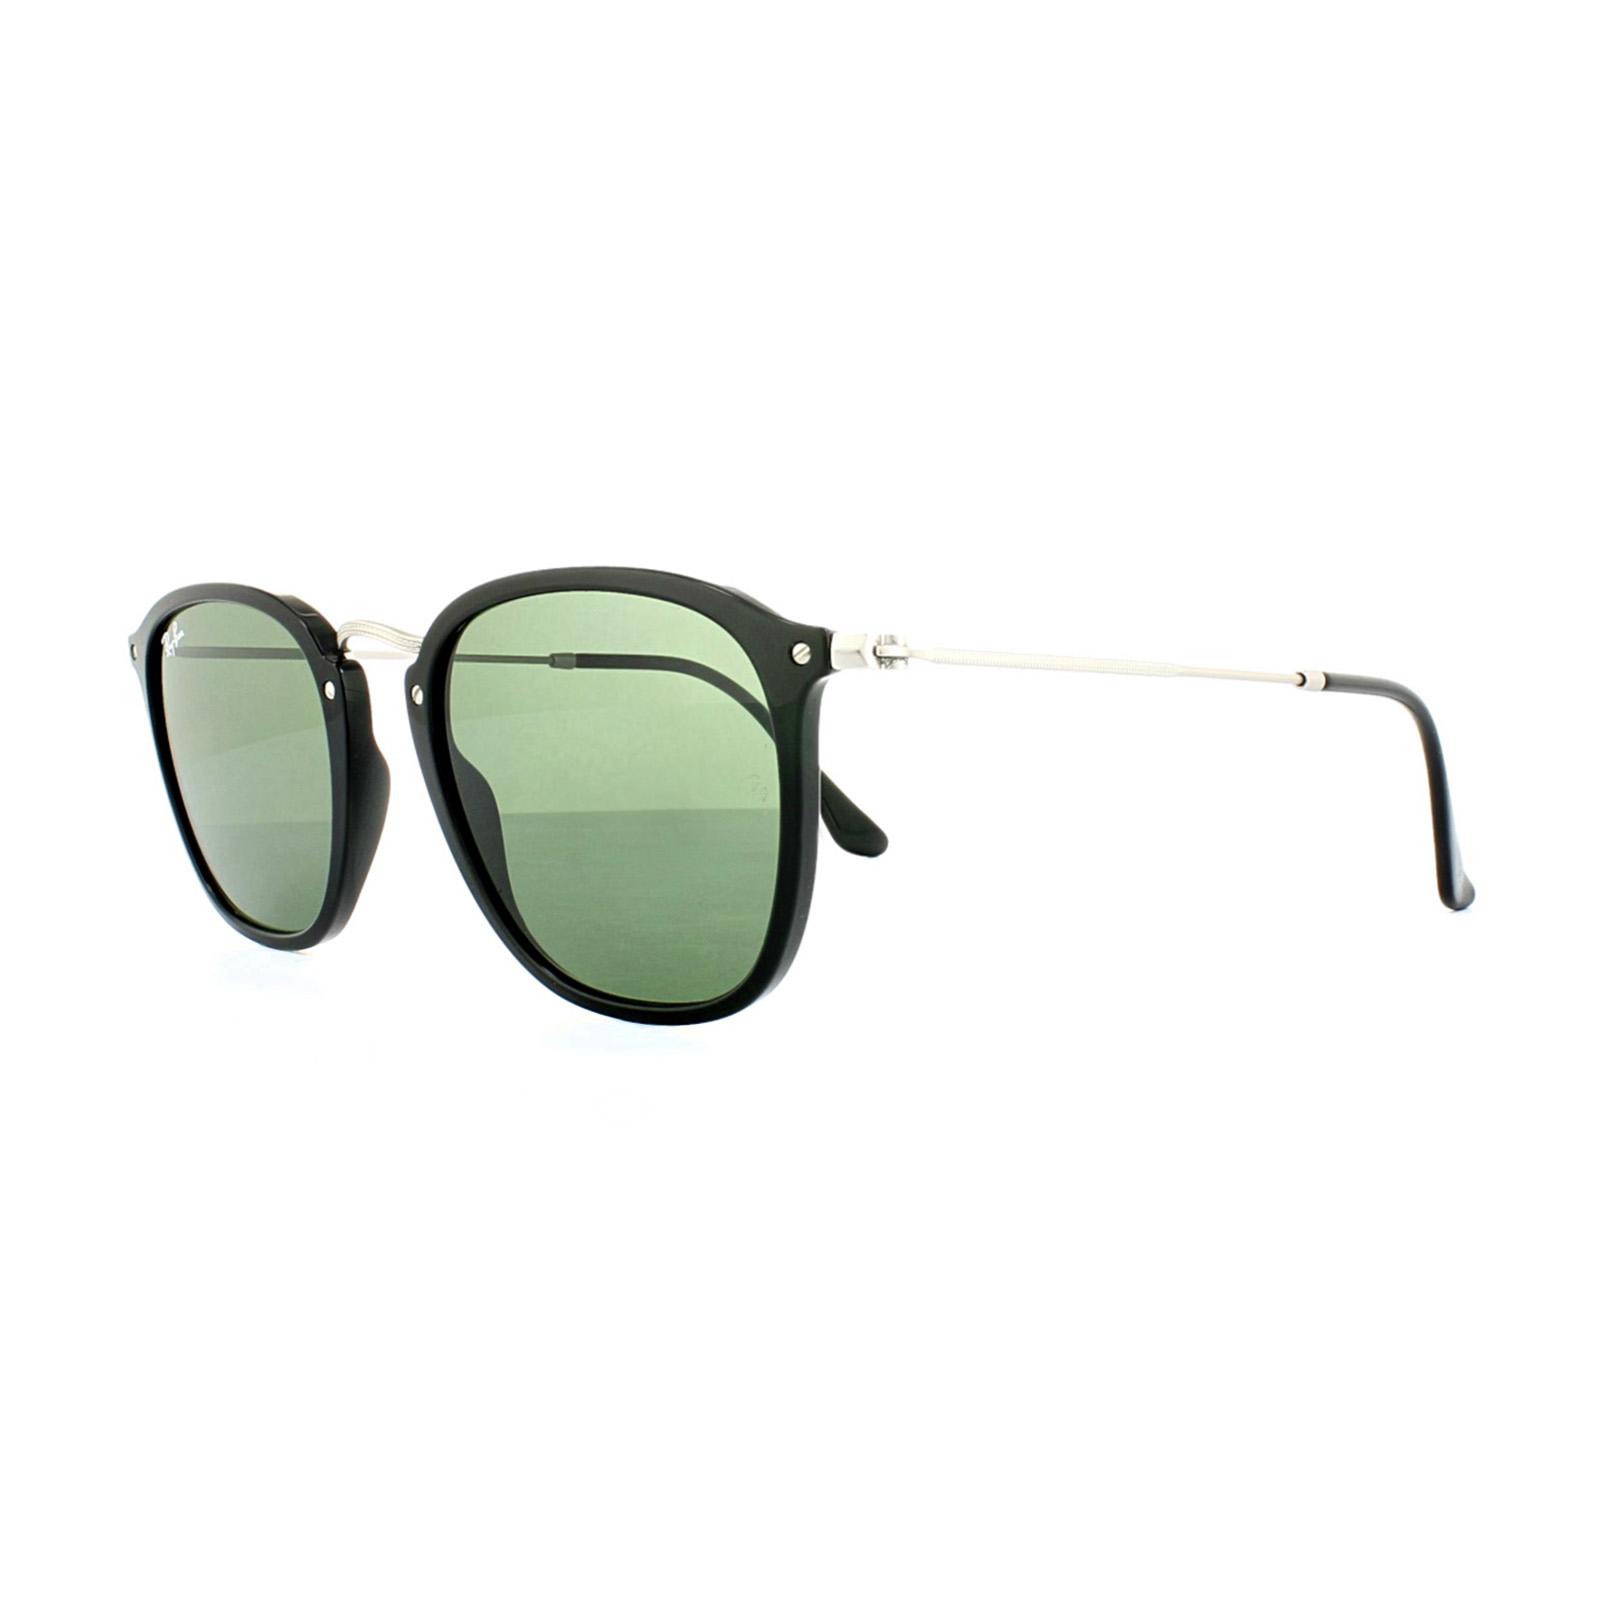 3c65e5c4e7e Ray-Ban Sunglasses 2448N 710 Tortoise Gold Brown B-15 8053672672237 ...